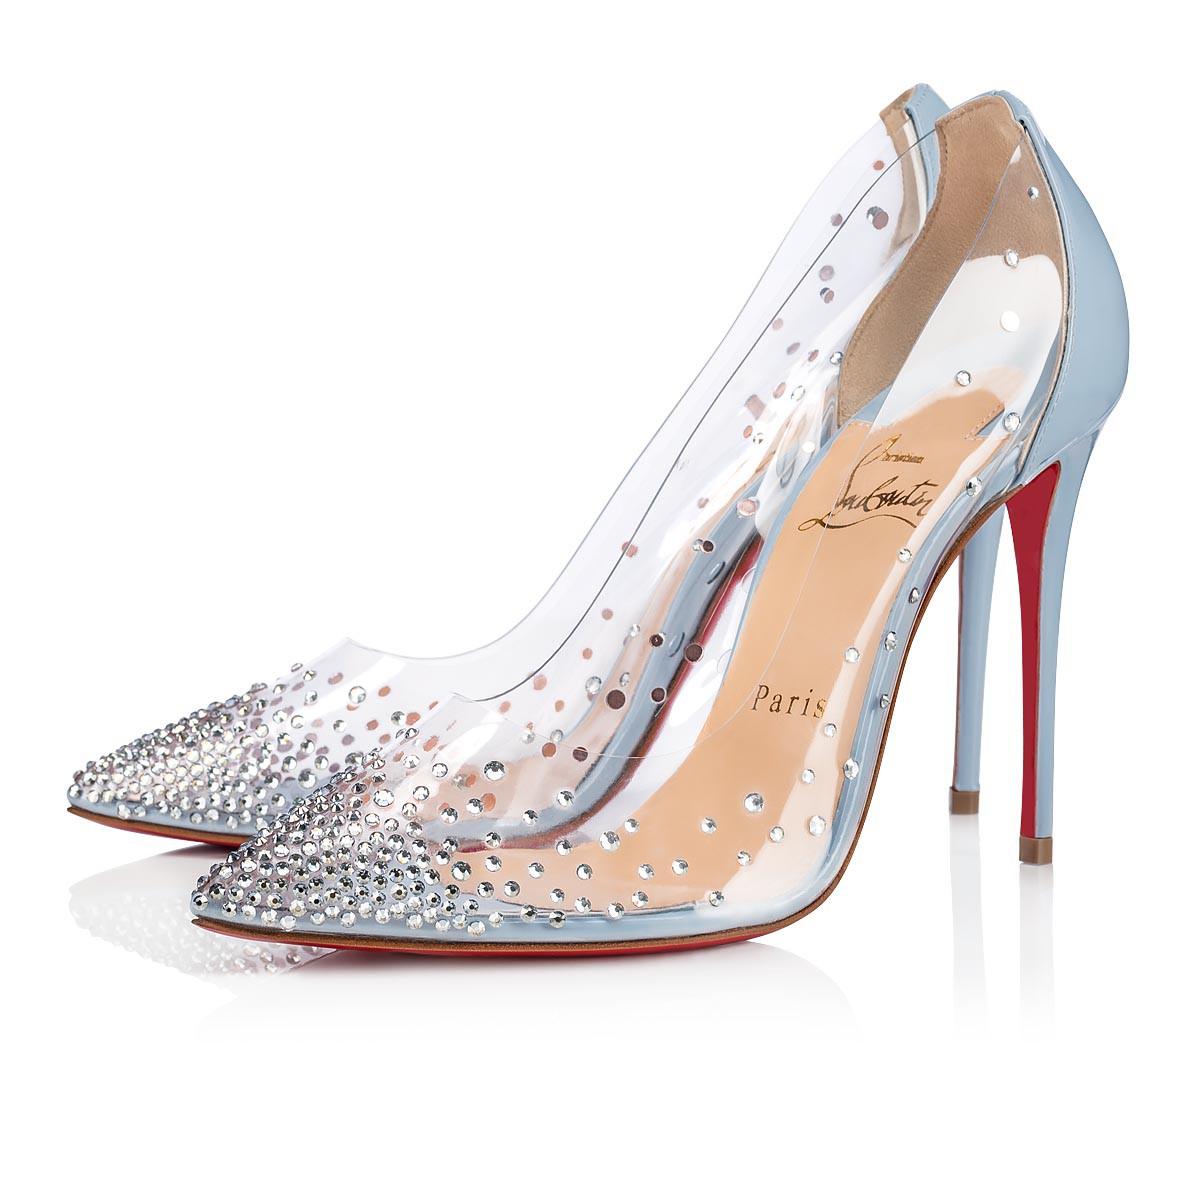 buy popular 585d9 d3a7b Degrastrass 100 Version Sky Strass - Women Shoes - Christian Louboutin